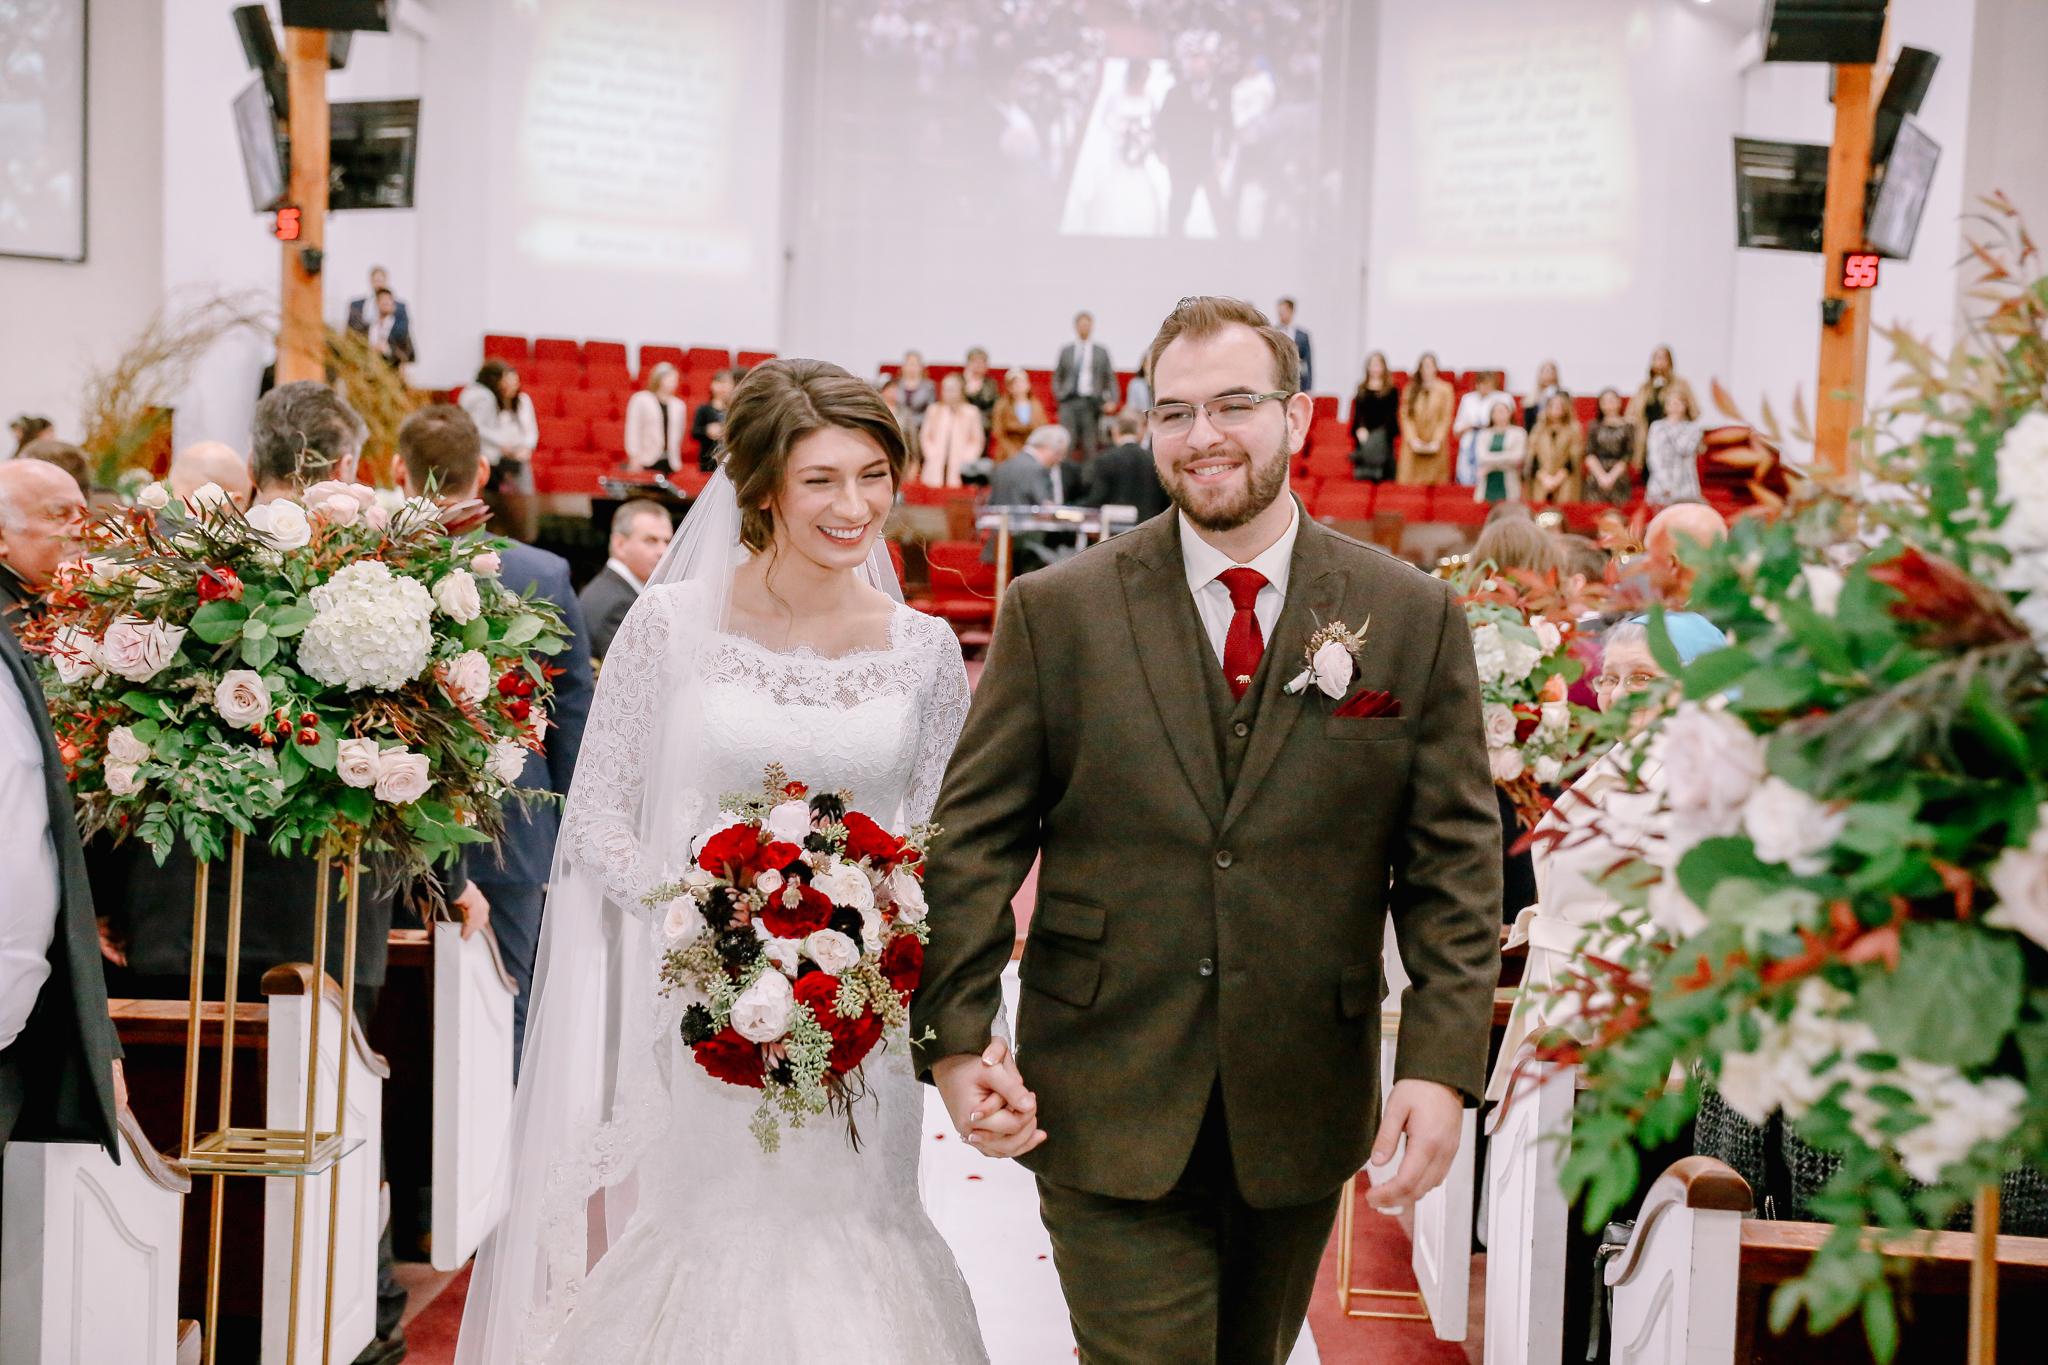 Manu and Laura - Portland Wedding Photographer - 51.jpg